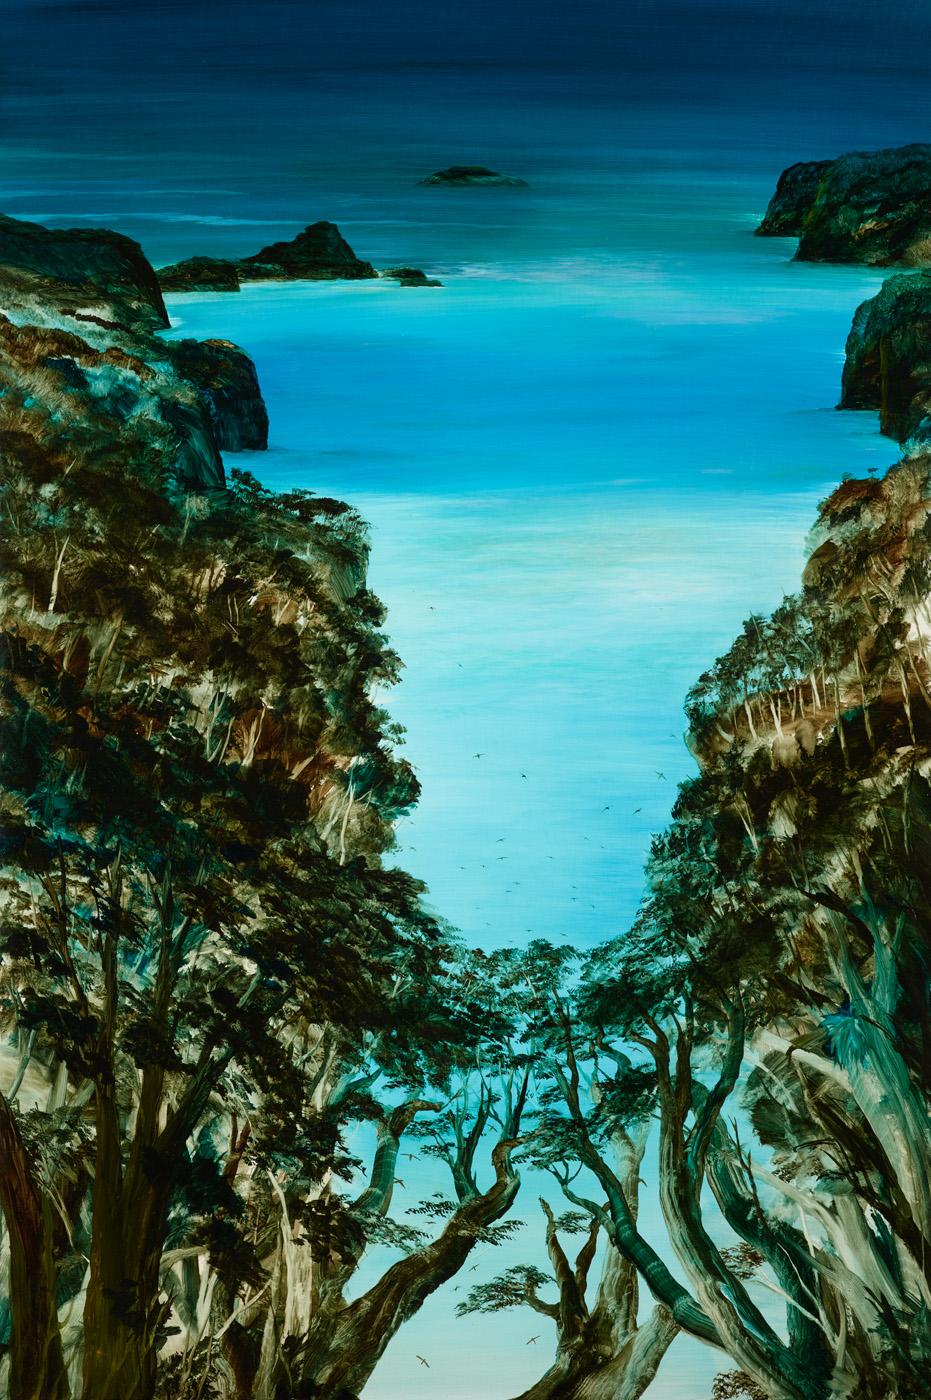 Manu Whenua  2016 Oil on canvas 1520 x 1010mm  Enquire